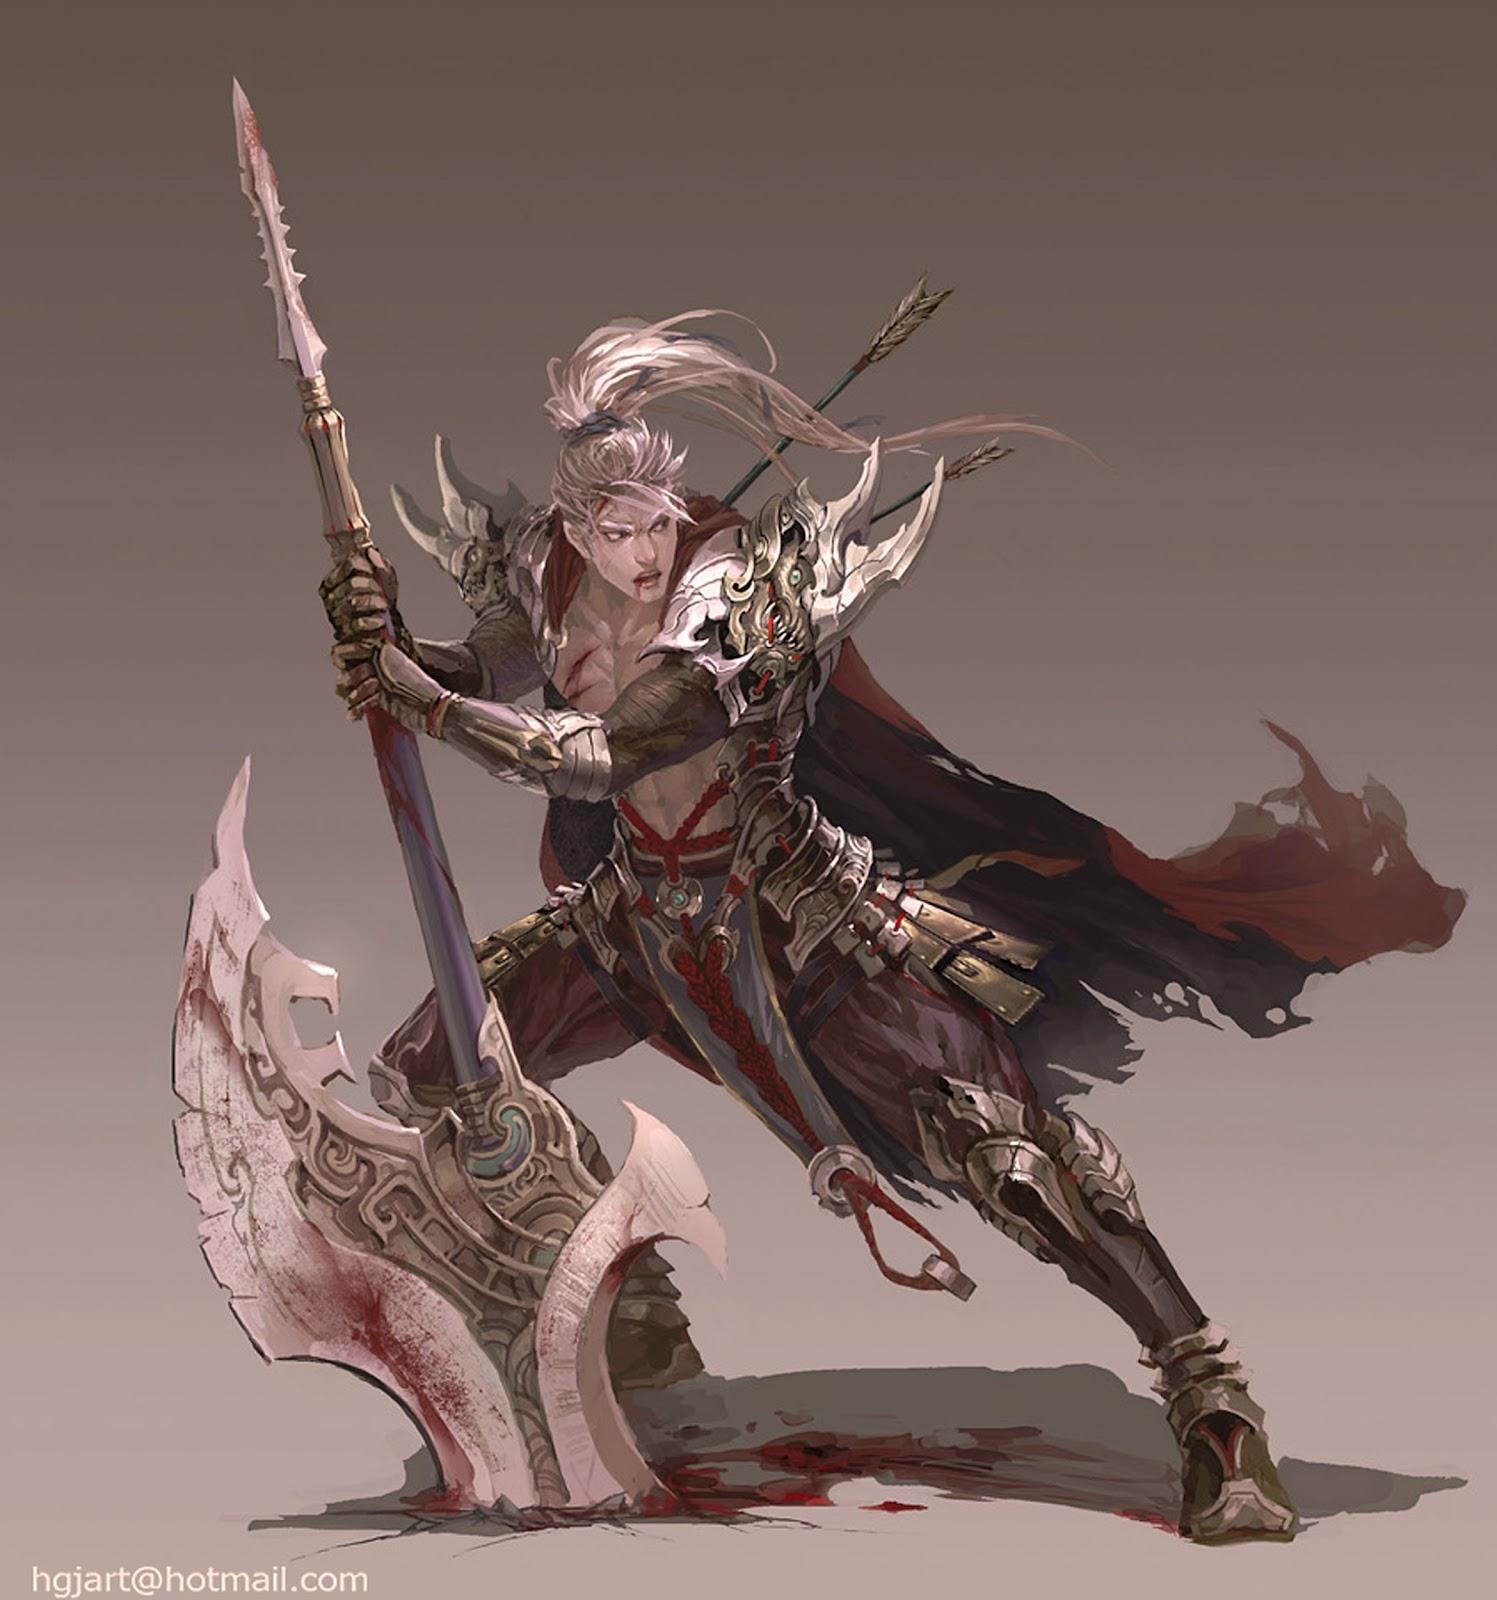 Drawn warrior giant Male+mecha+giant+axe+blade+scythe+blade+shogun+japan+samurai+ male+mecha+giant+axe+blade+scythe+blade+shogun+